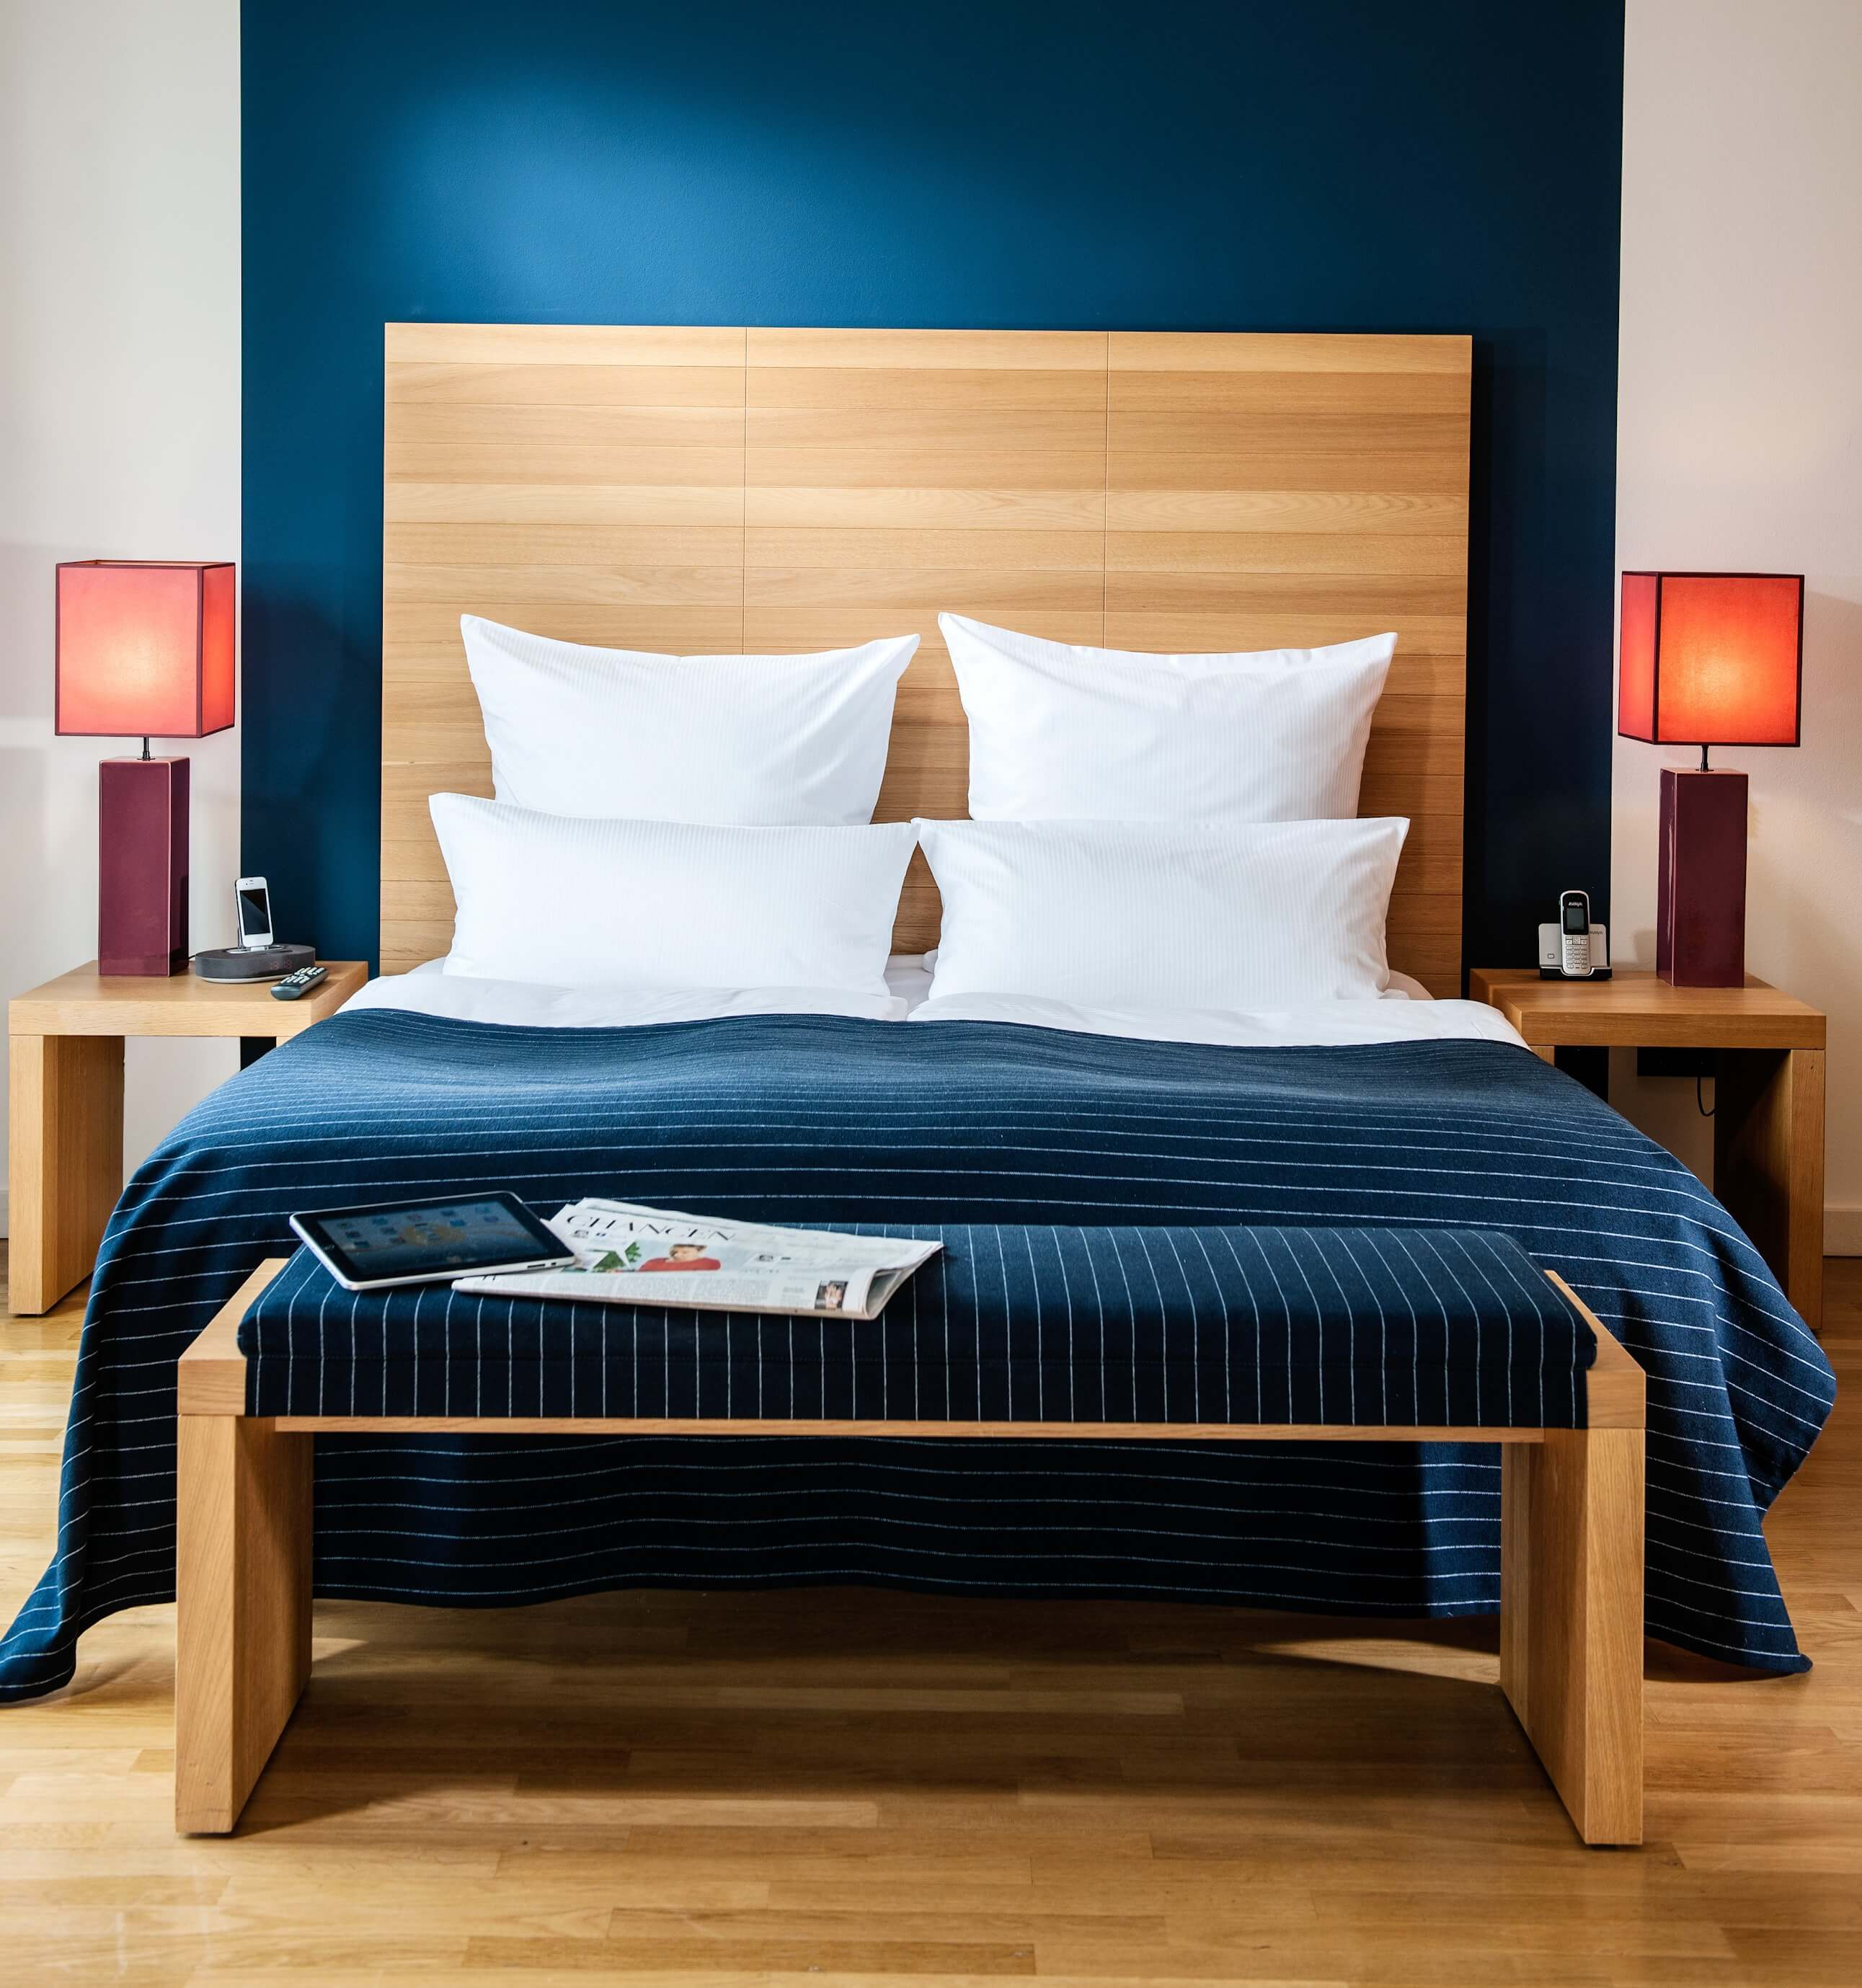 unser privatkoch service im appartement hotel kitchennerds. Black Bedroom Furniture Sets. Home Design Ideas